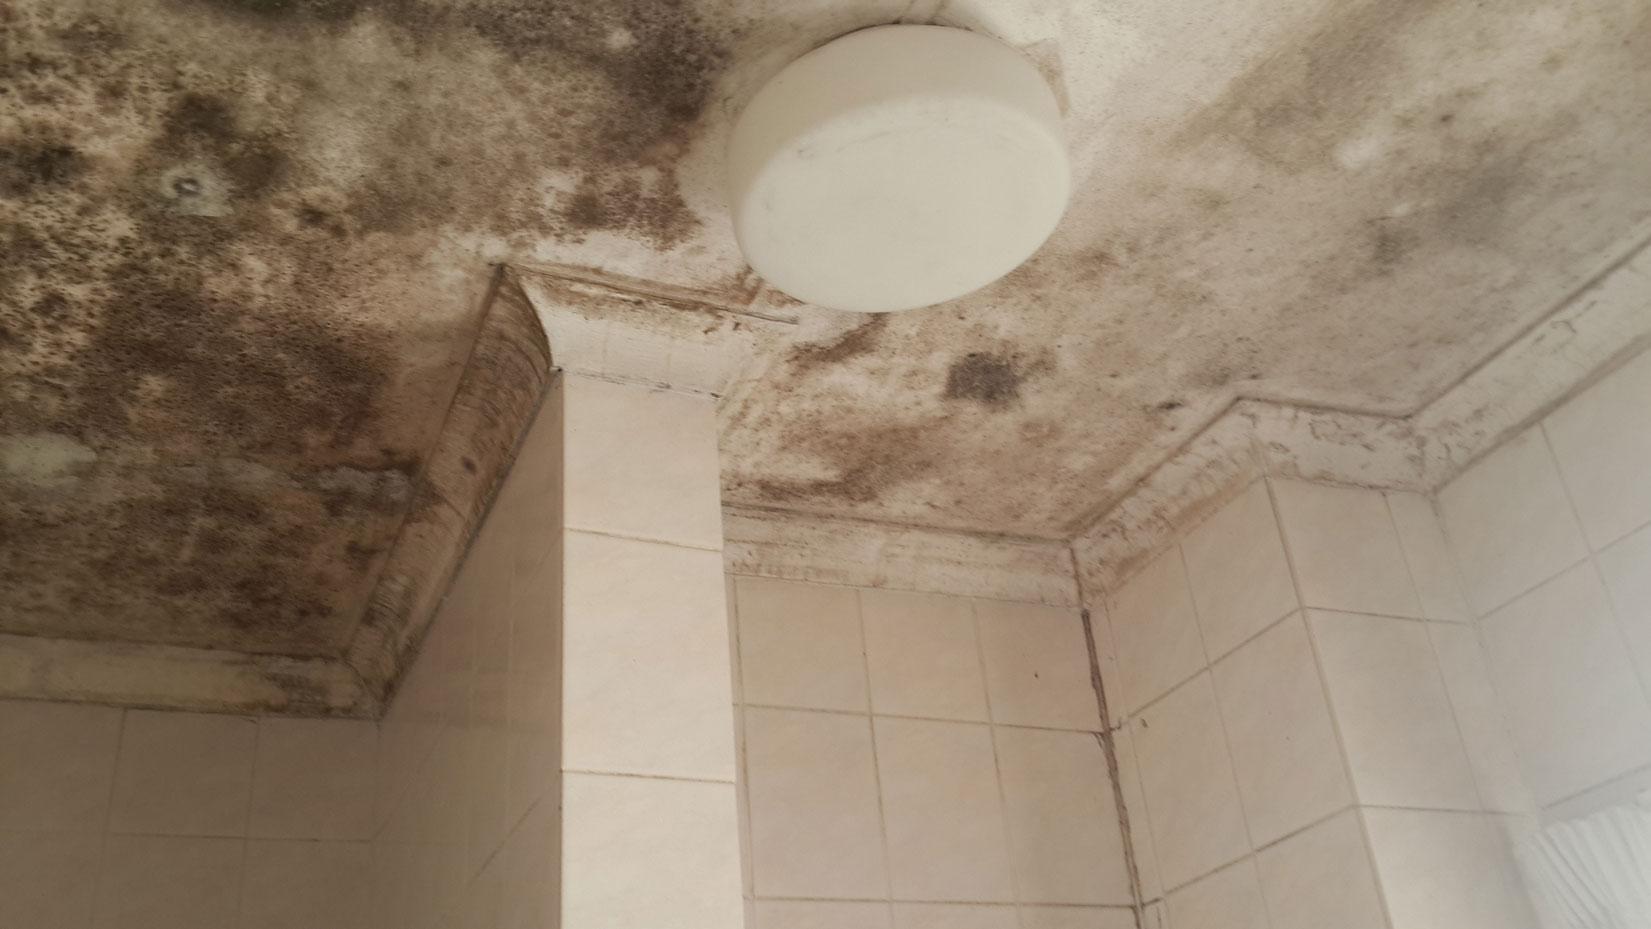 Bathroom mould mold mildew removal in randburg - Bathroom wall mold removal ...